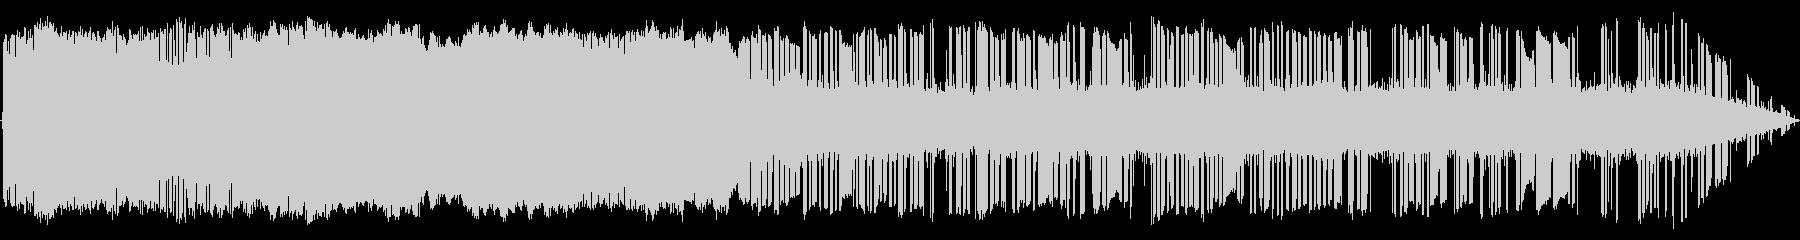 Interface Noiseの未再生の波形